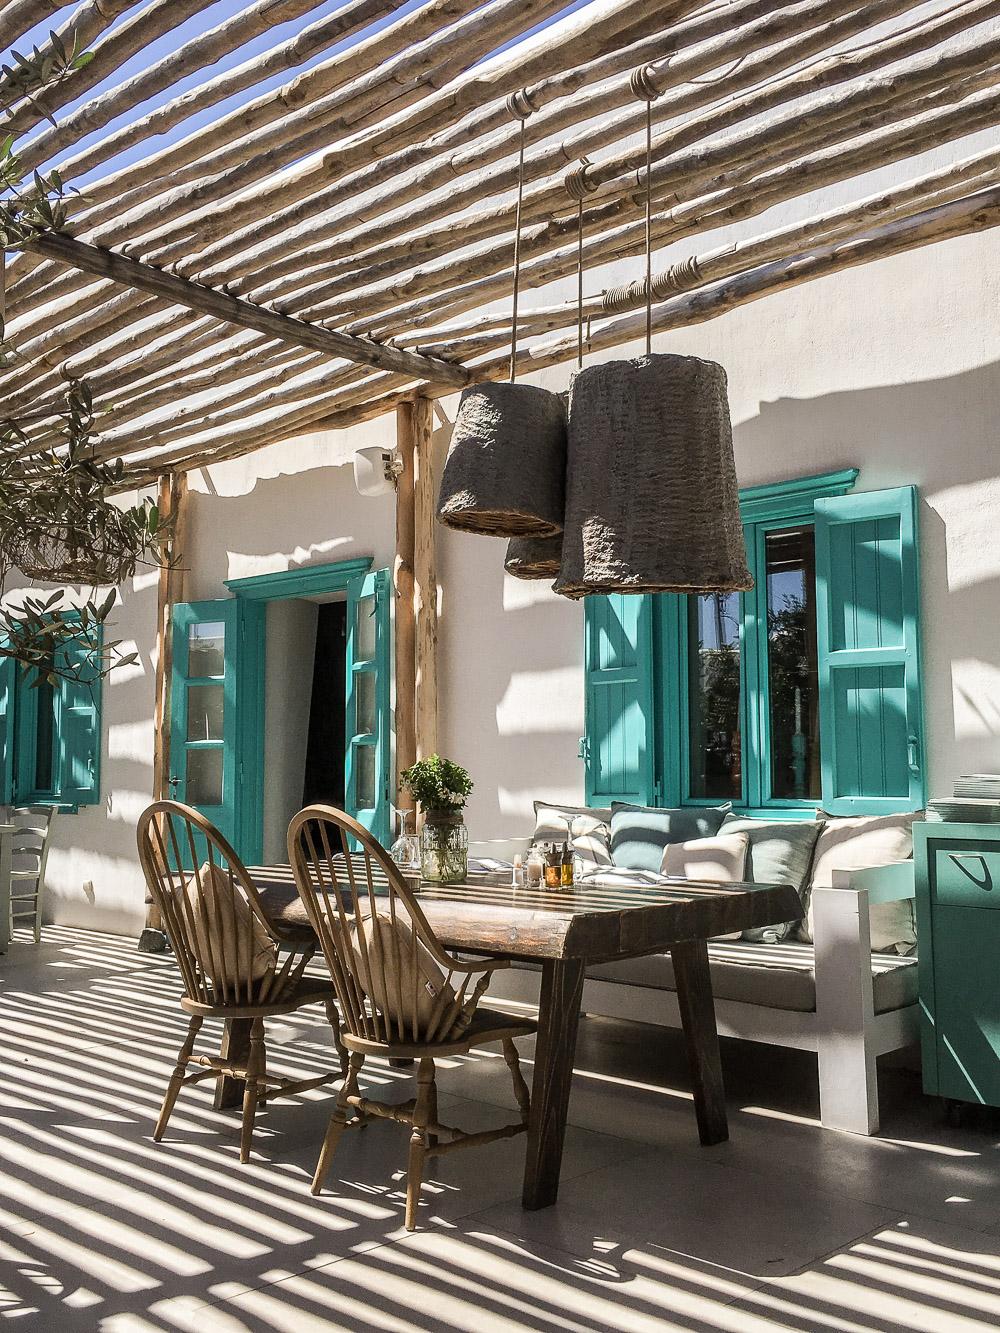 Almyra Restaurant in Mykonos